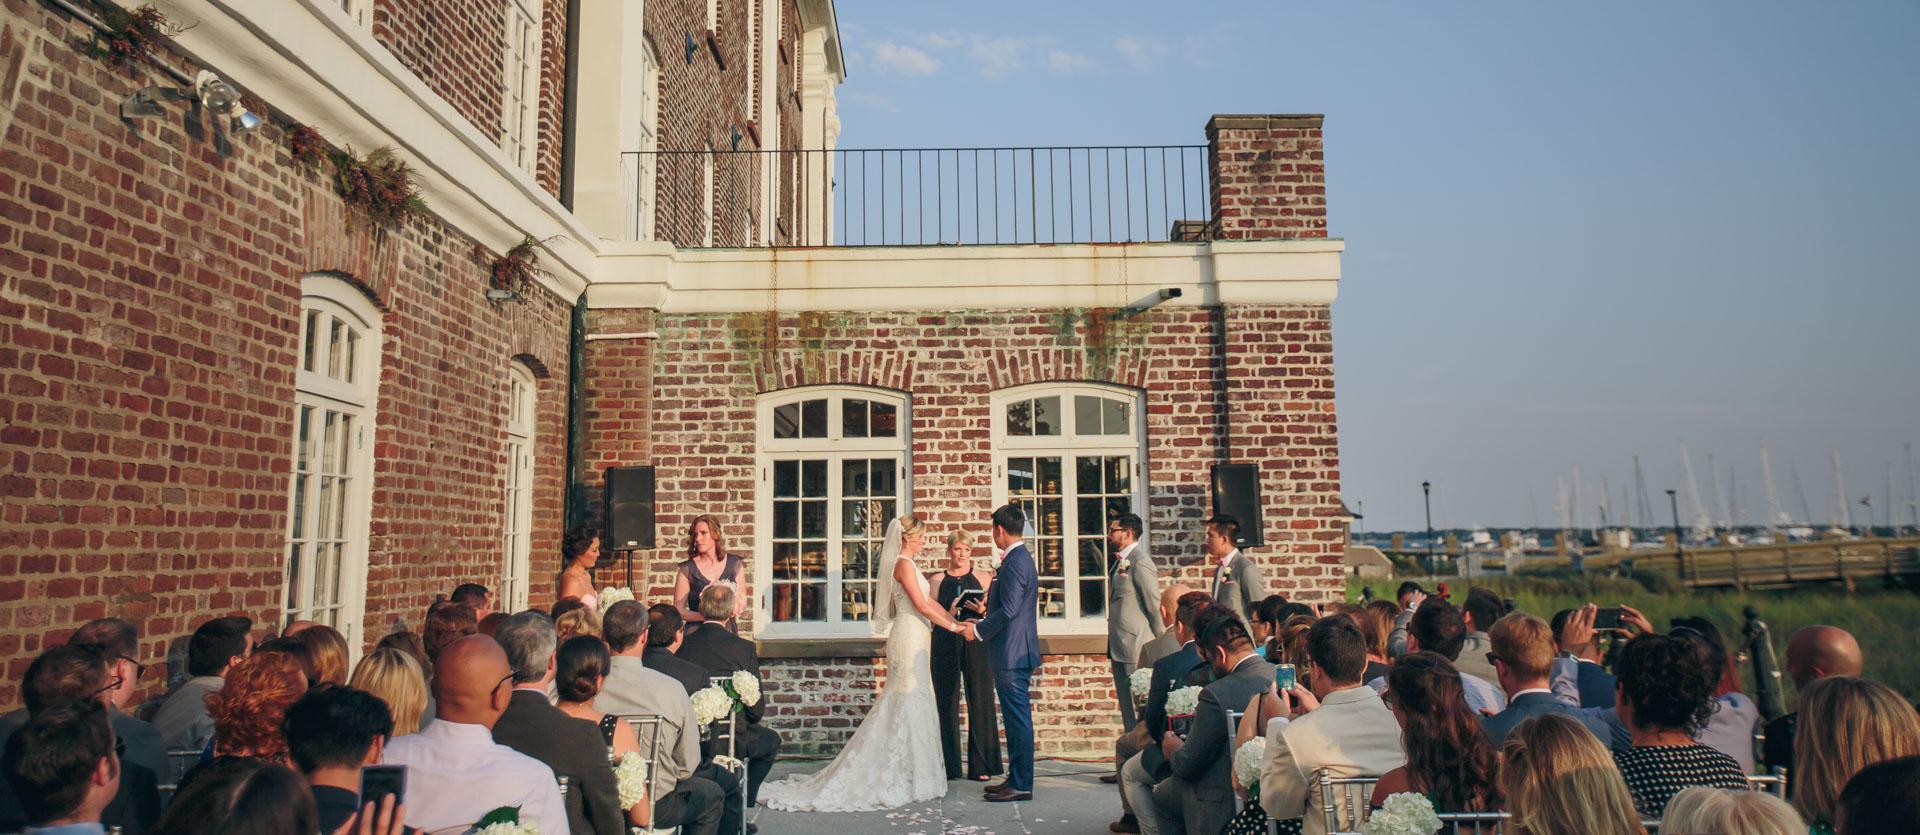 rice-mill-wedding